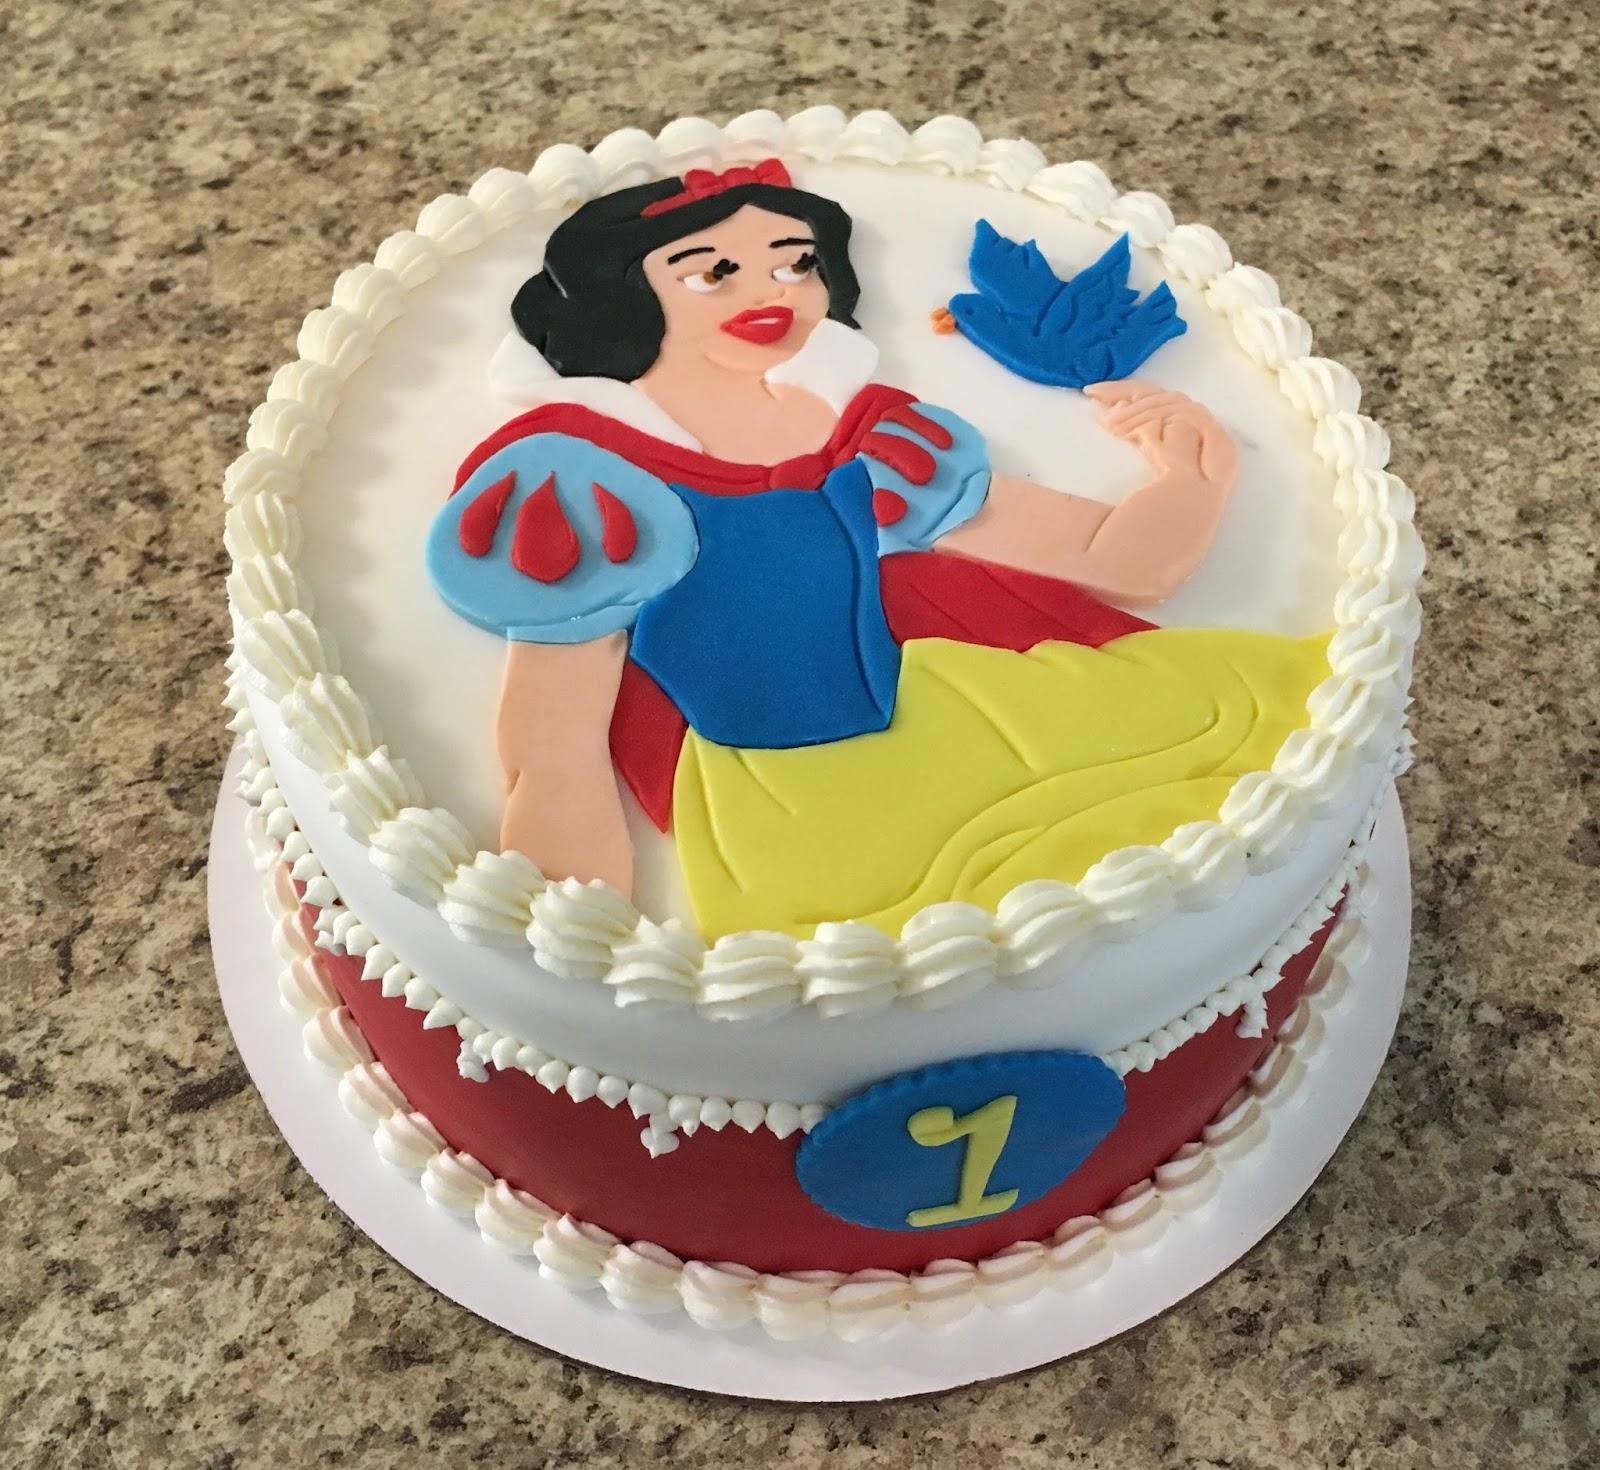 Groovy Cakes By Becky Snow White First Birthday Funny Birthday Cards Online Alyptdamsfinfo